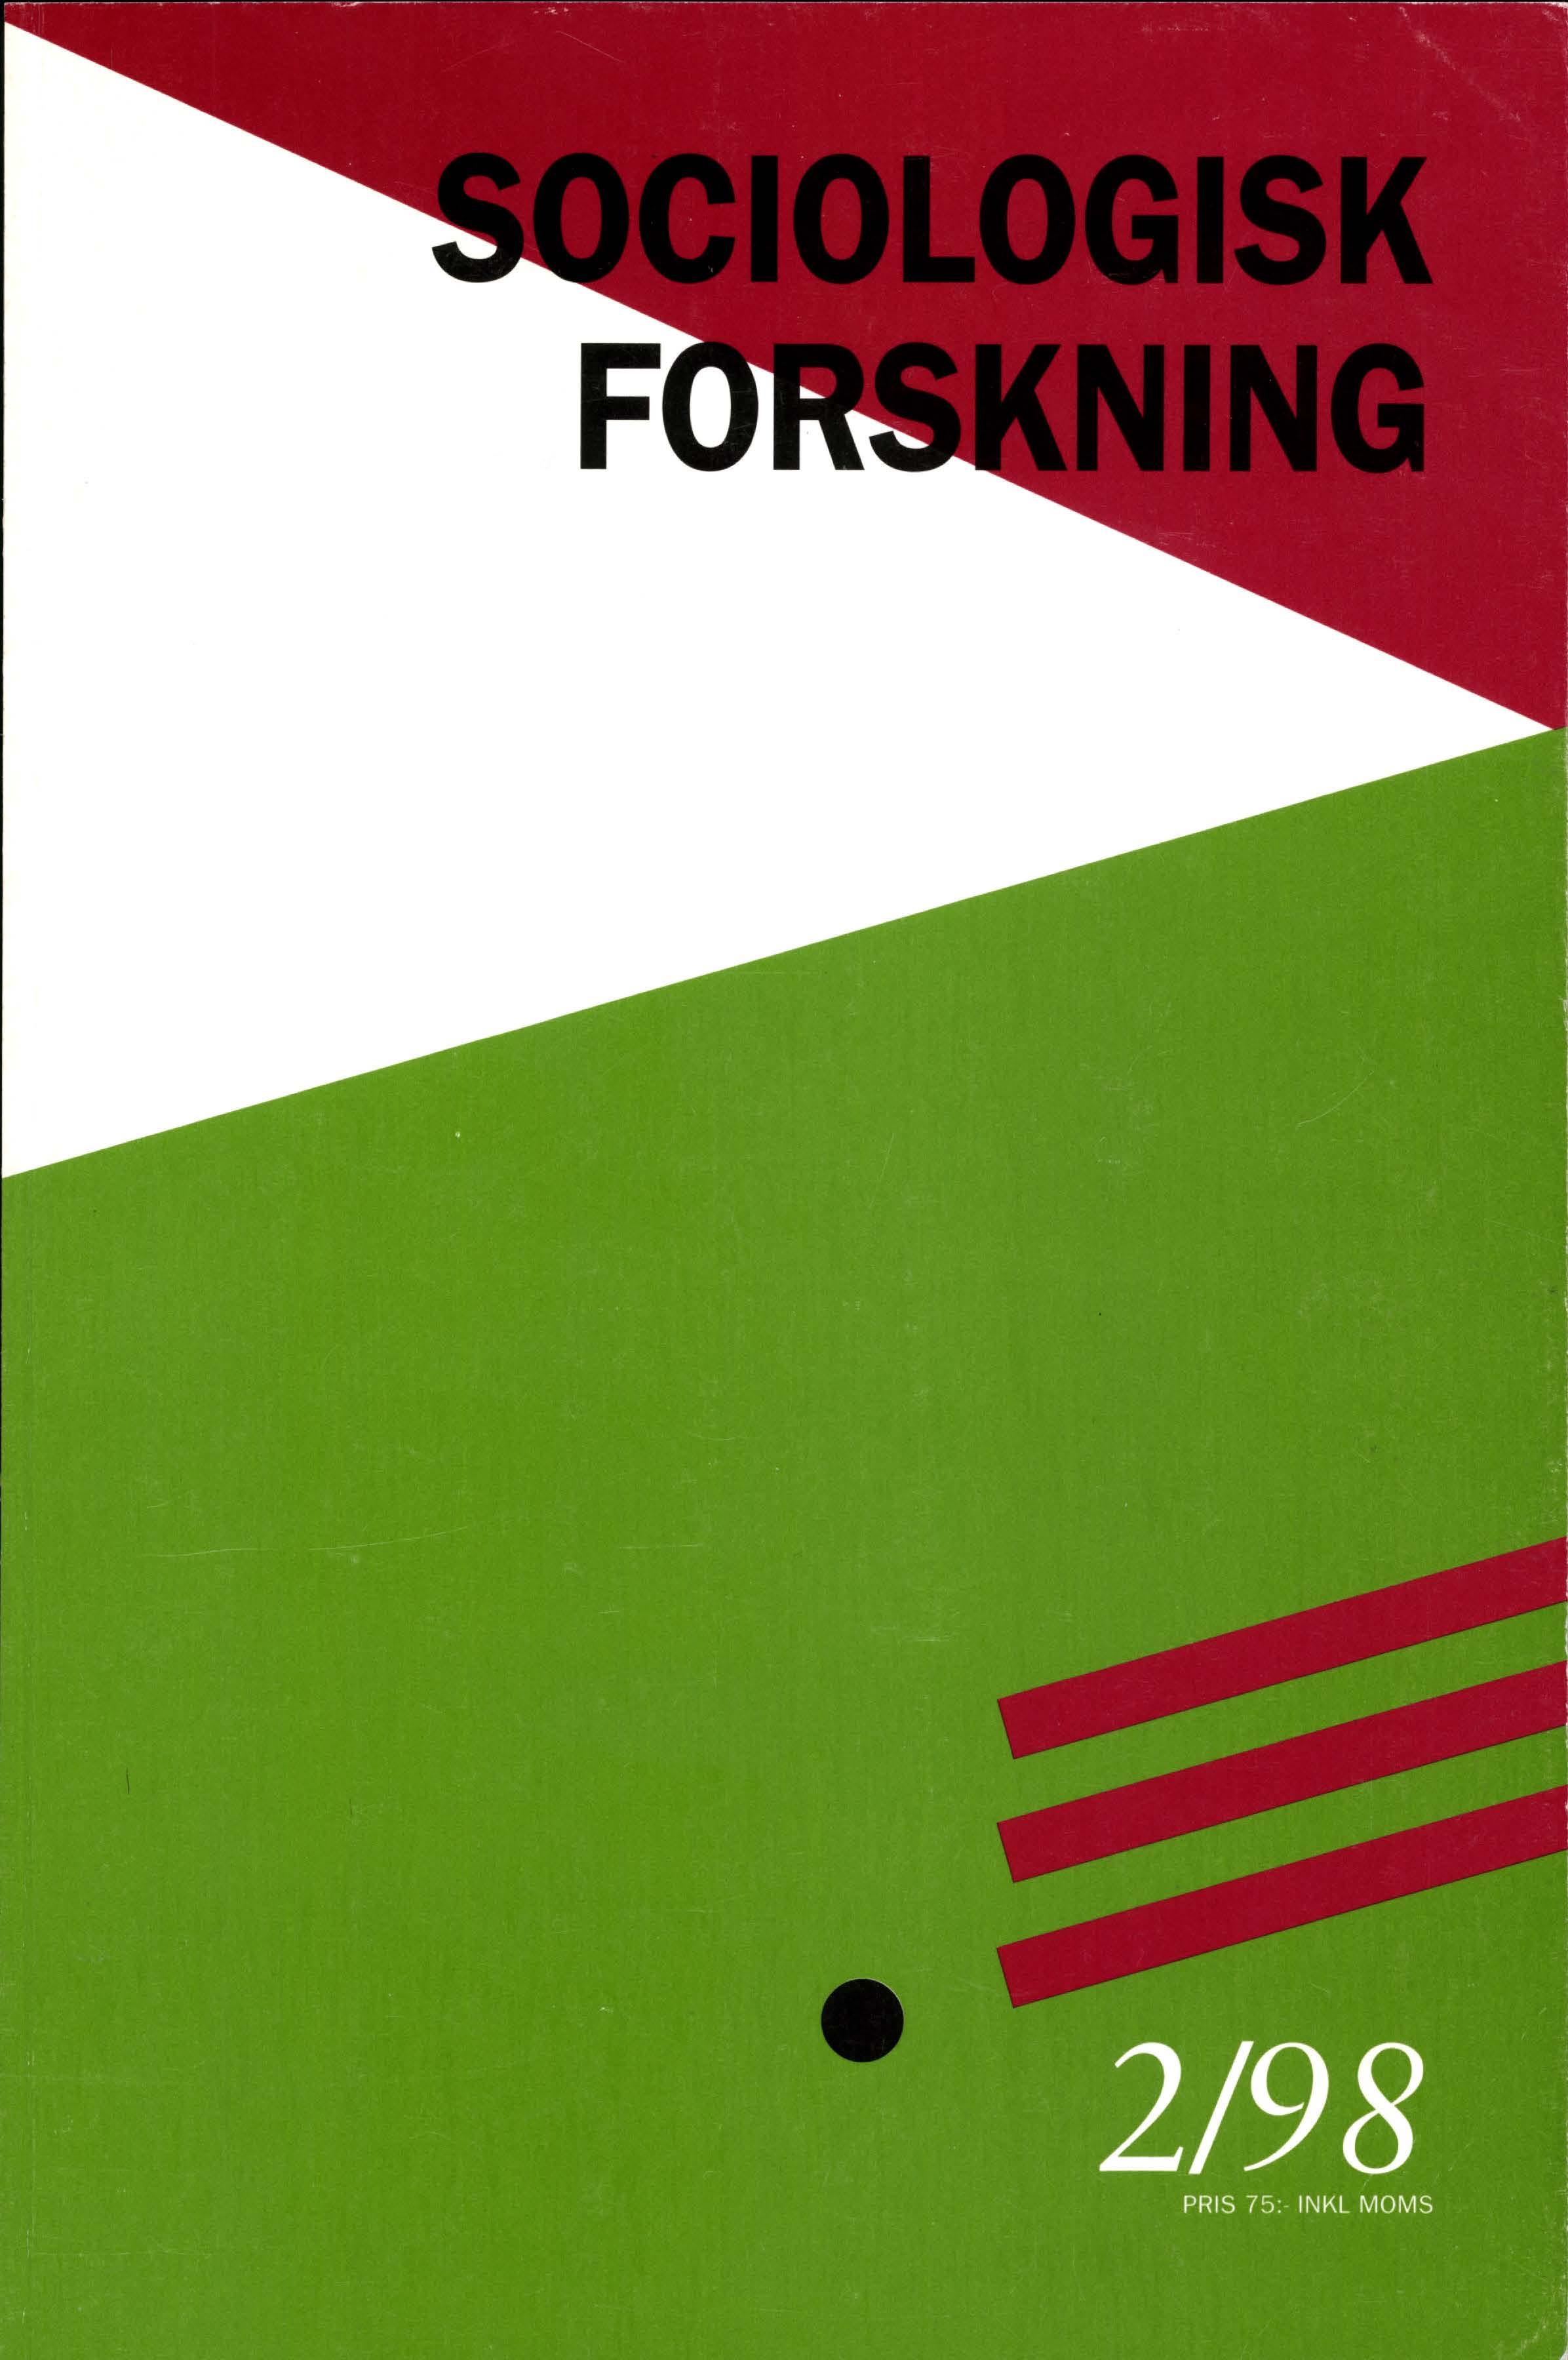 Visa Vol 35 Nr 2 (1998)